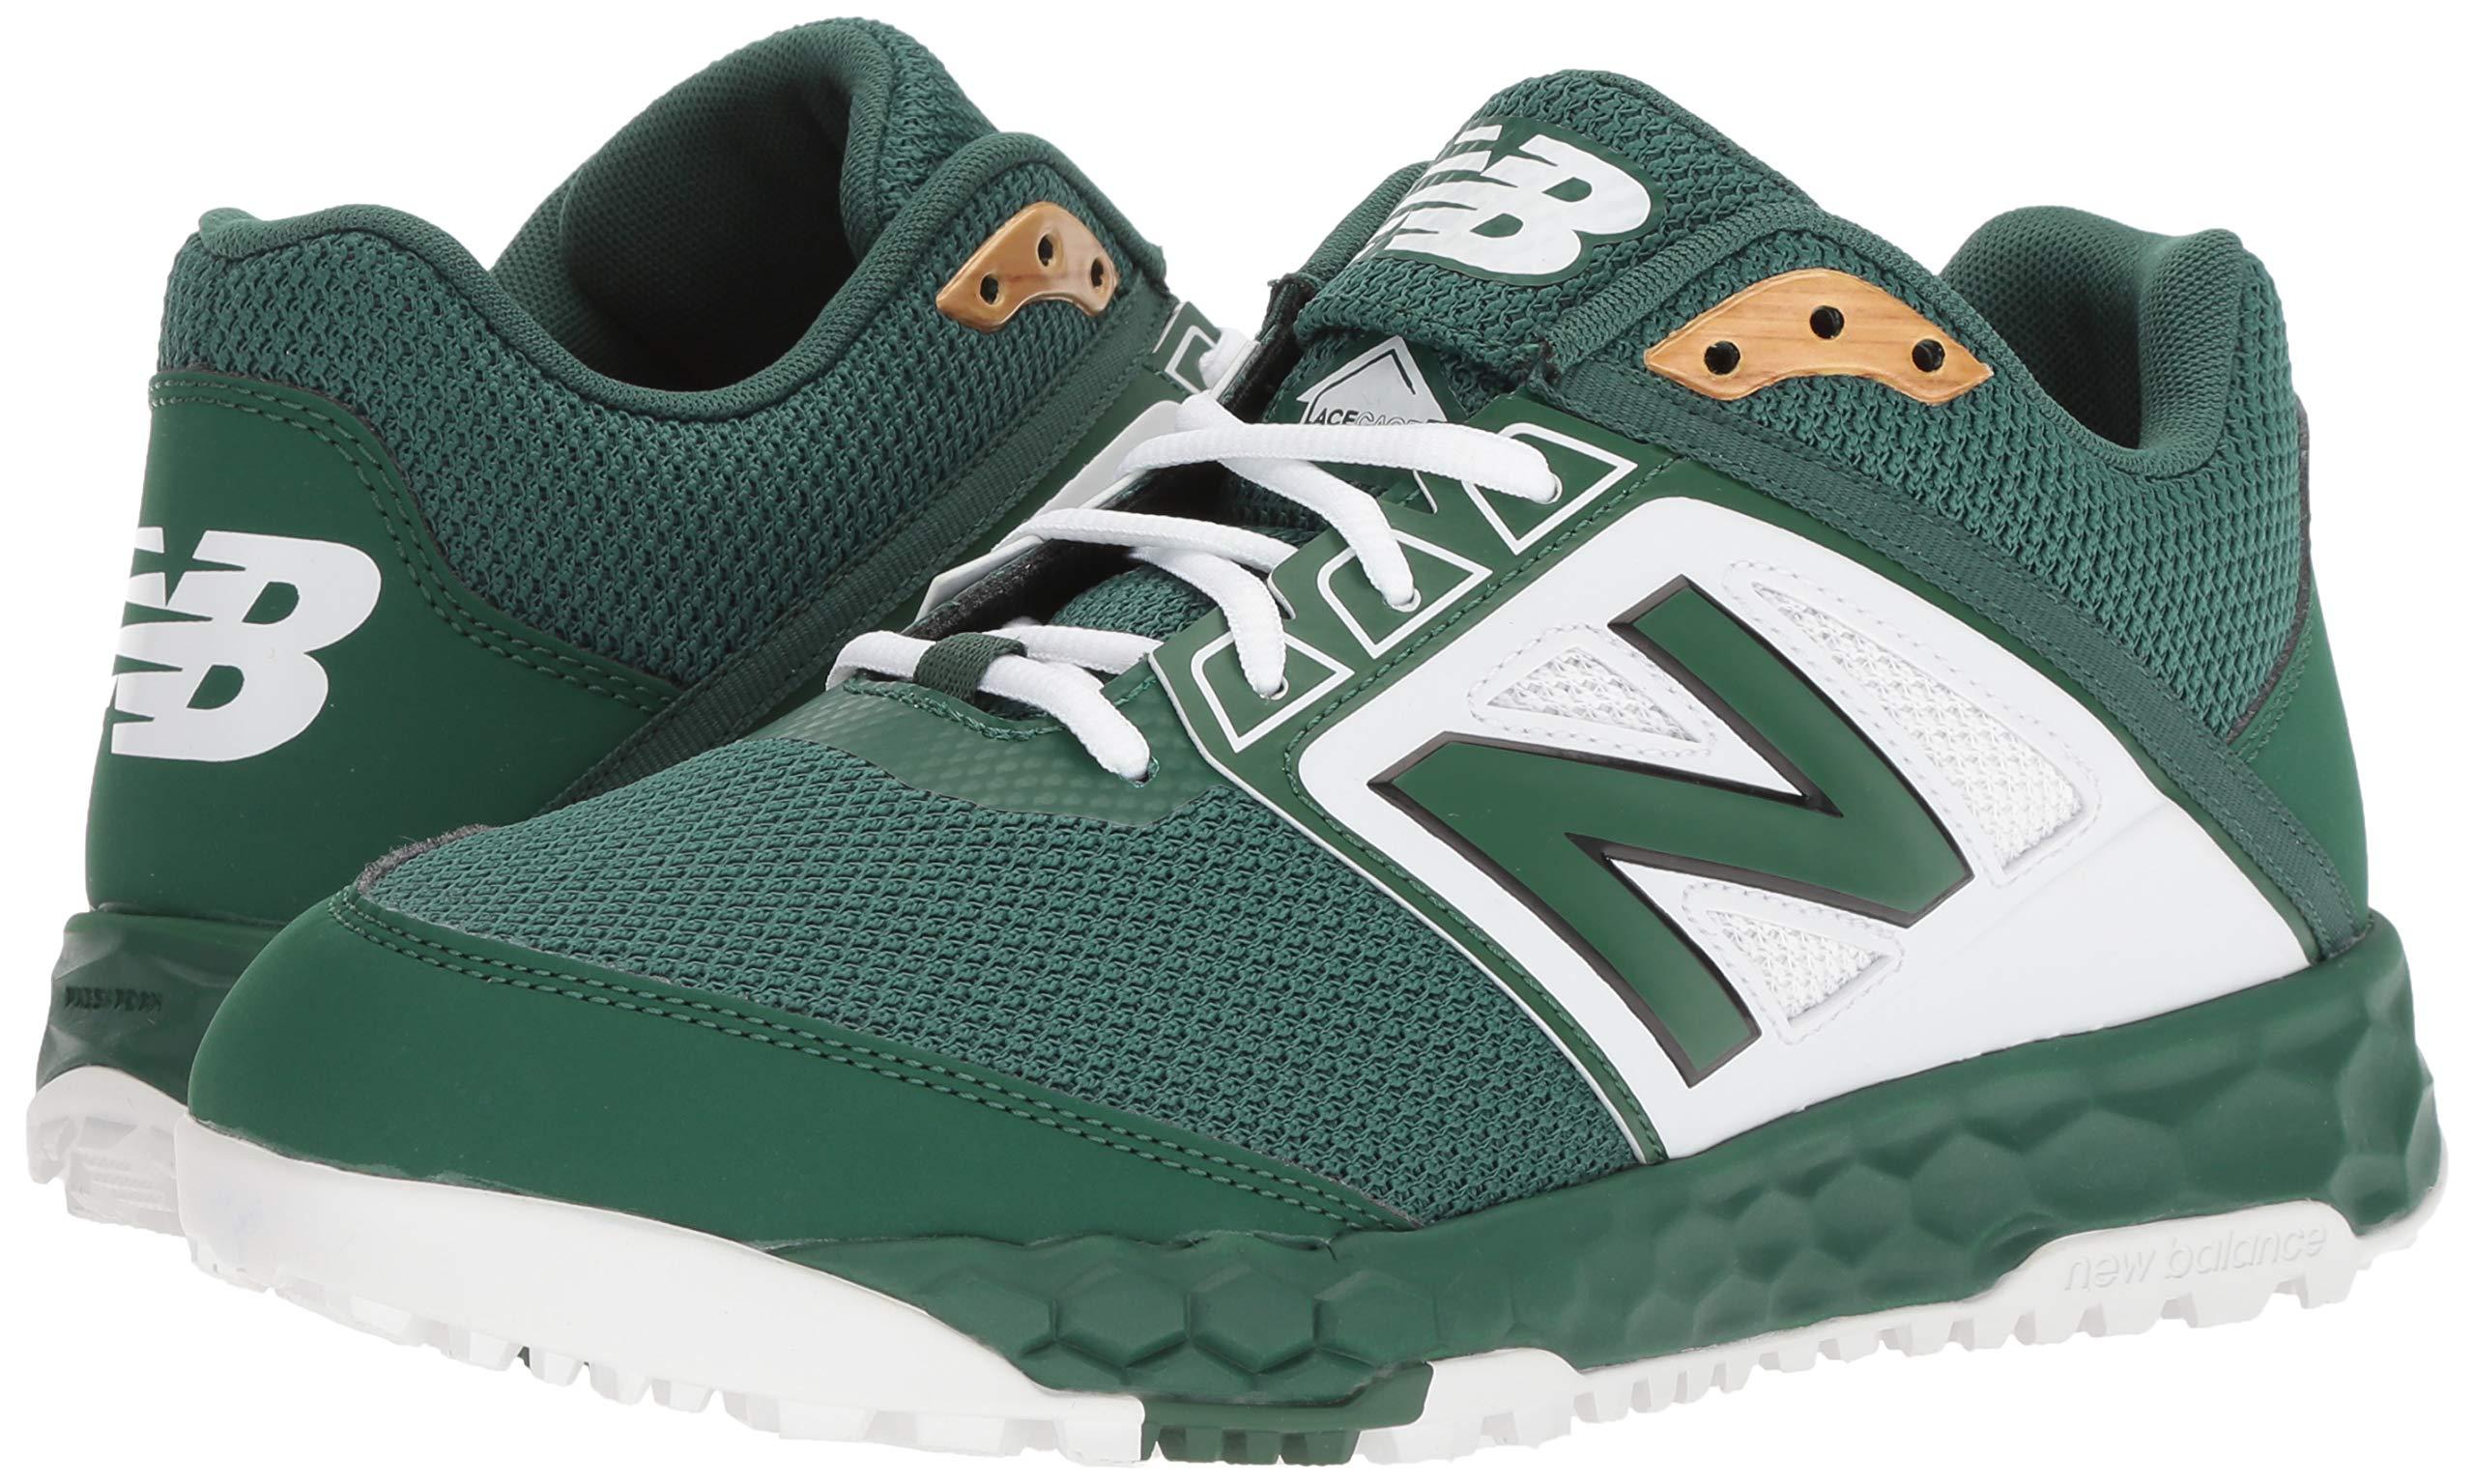 New Balance Men's 3000v4 Turf Baseball Shoe, Green/White, 5 D US by New Balance (Image #6)